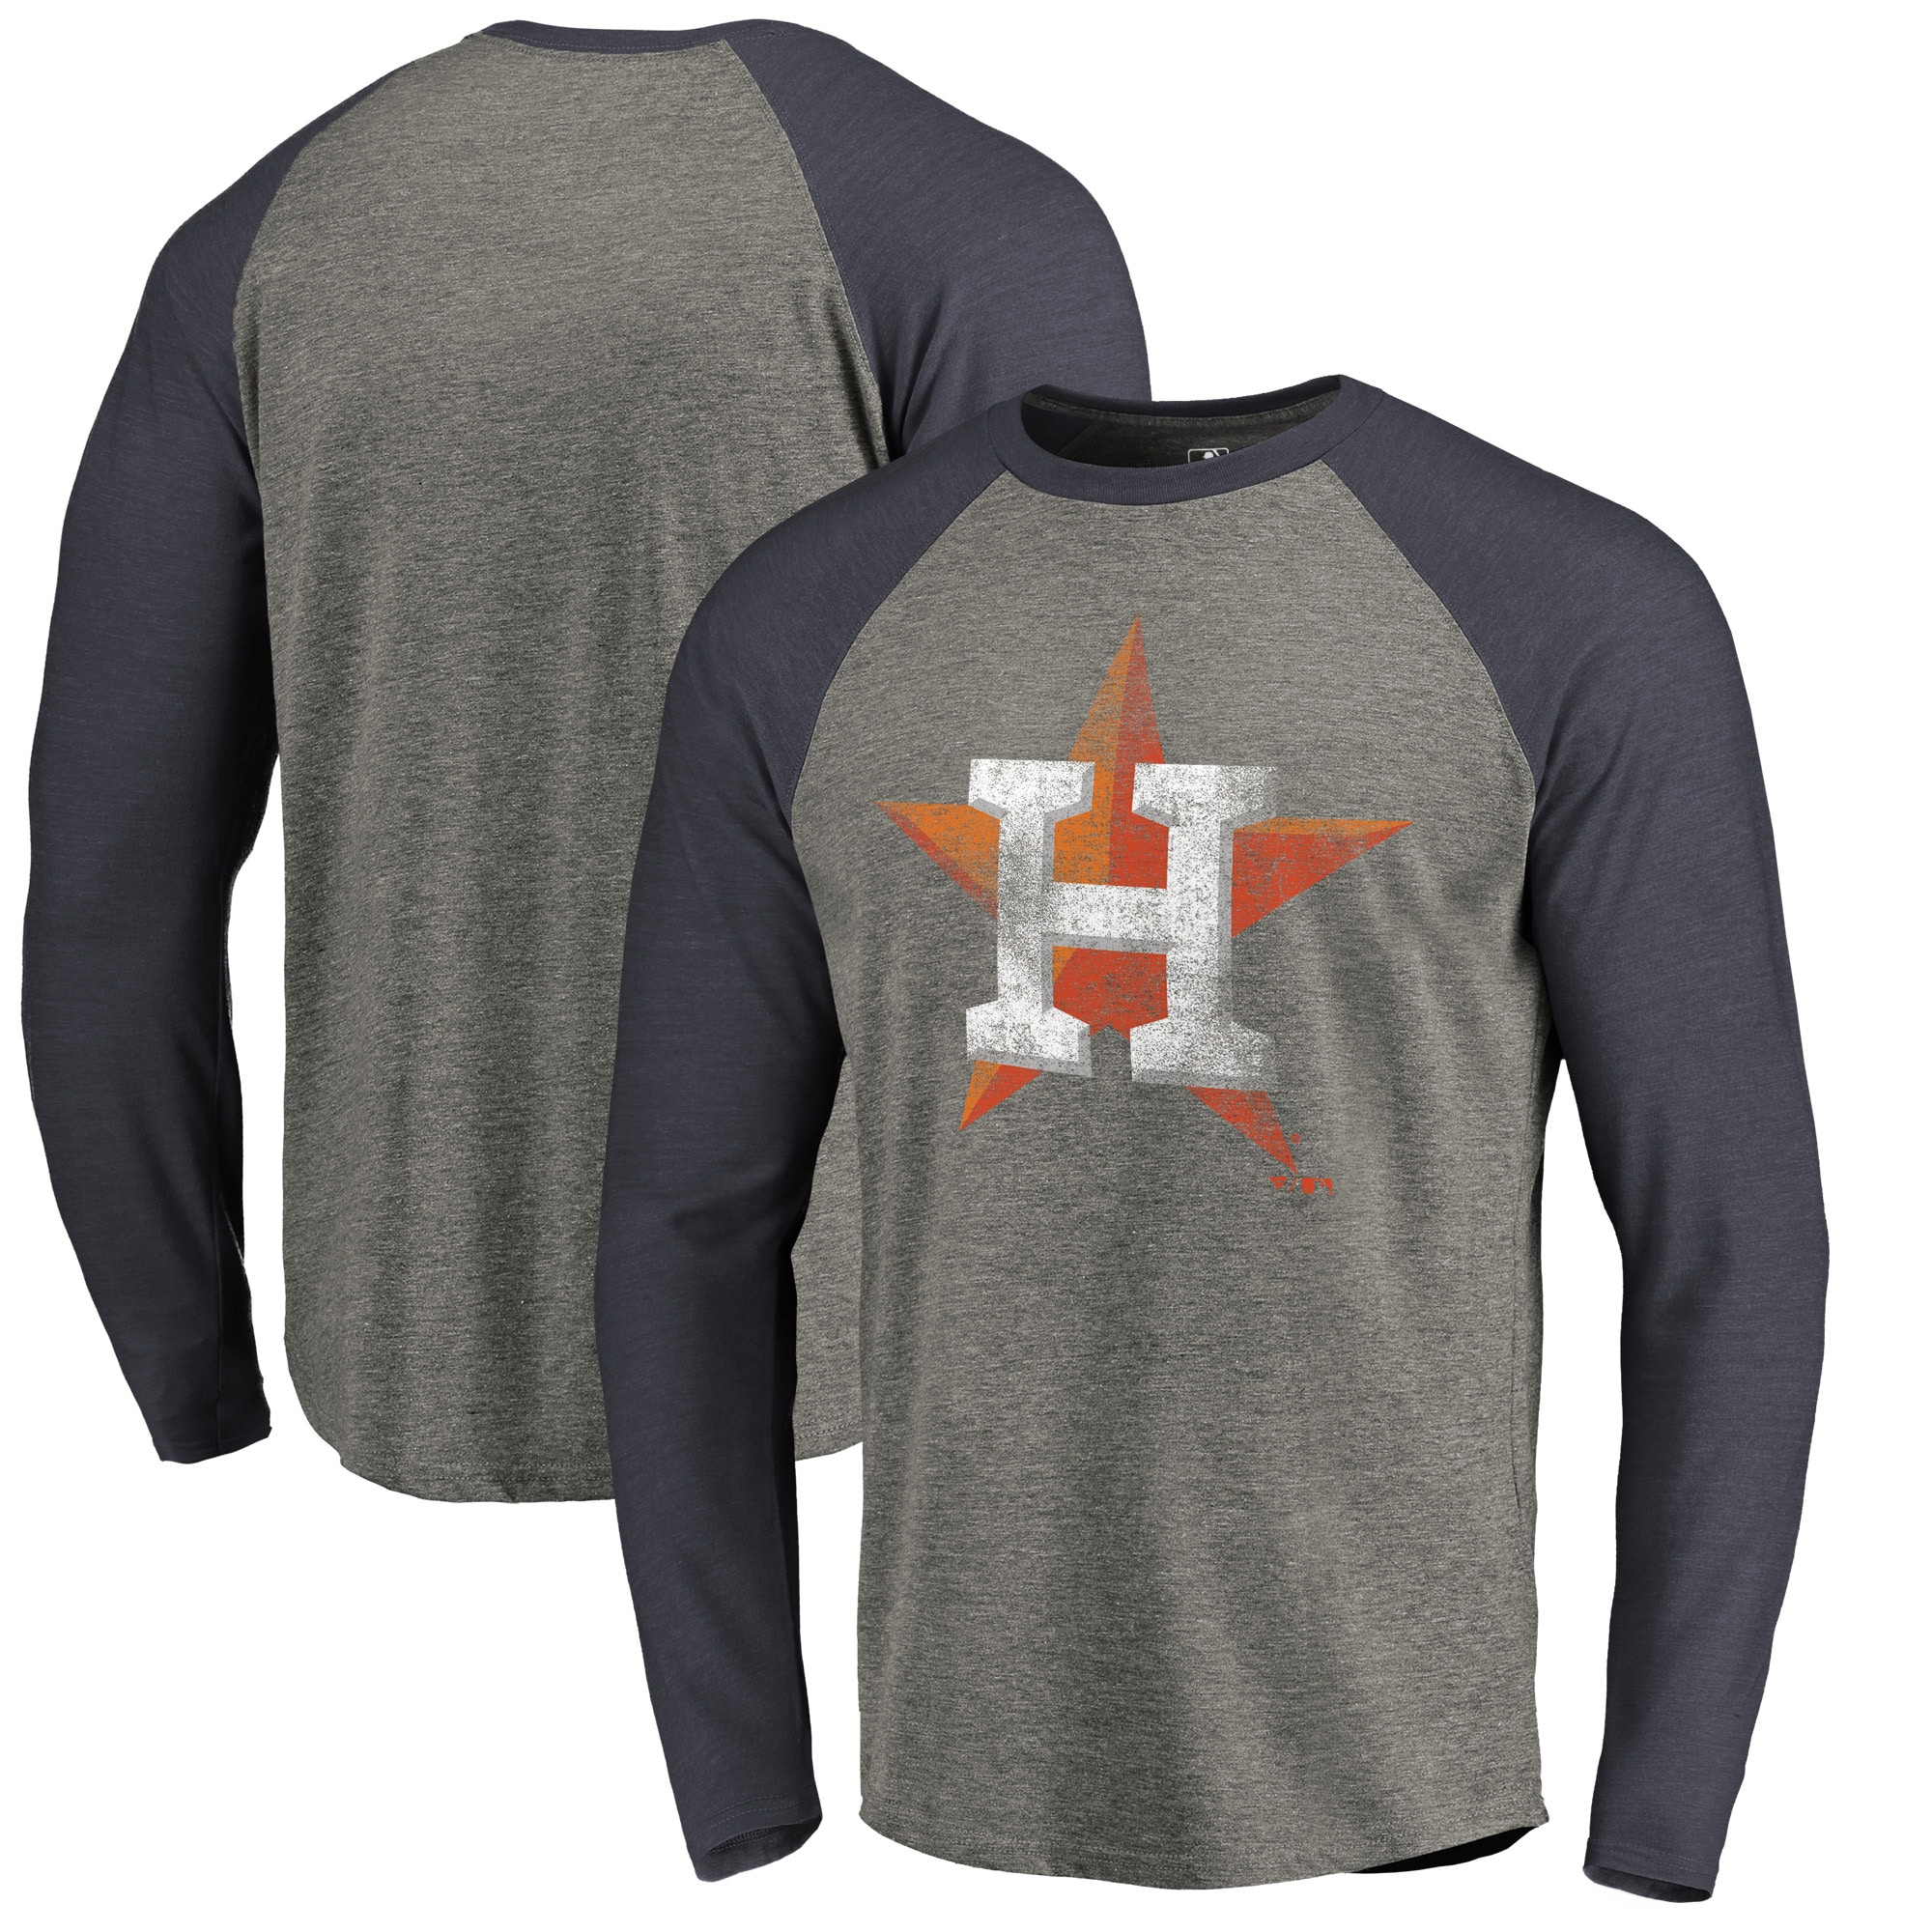 Houston Astros Fanatics Branded Distressed Team Long Sleeve Tri-Blend Raglan T-Shirt - Gray/Navy